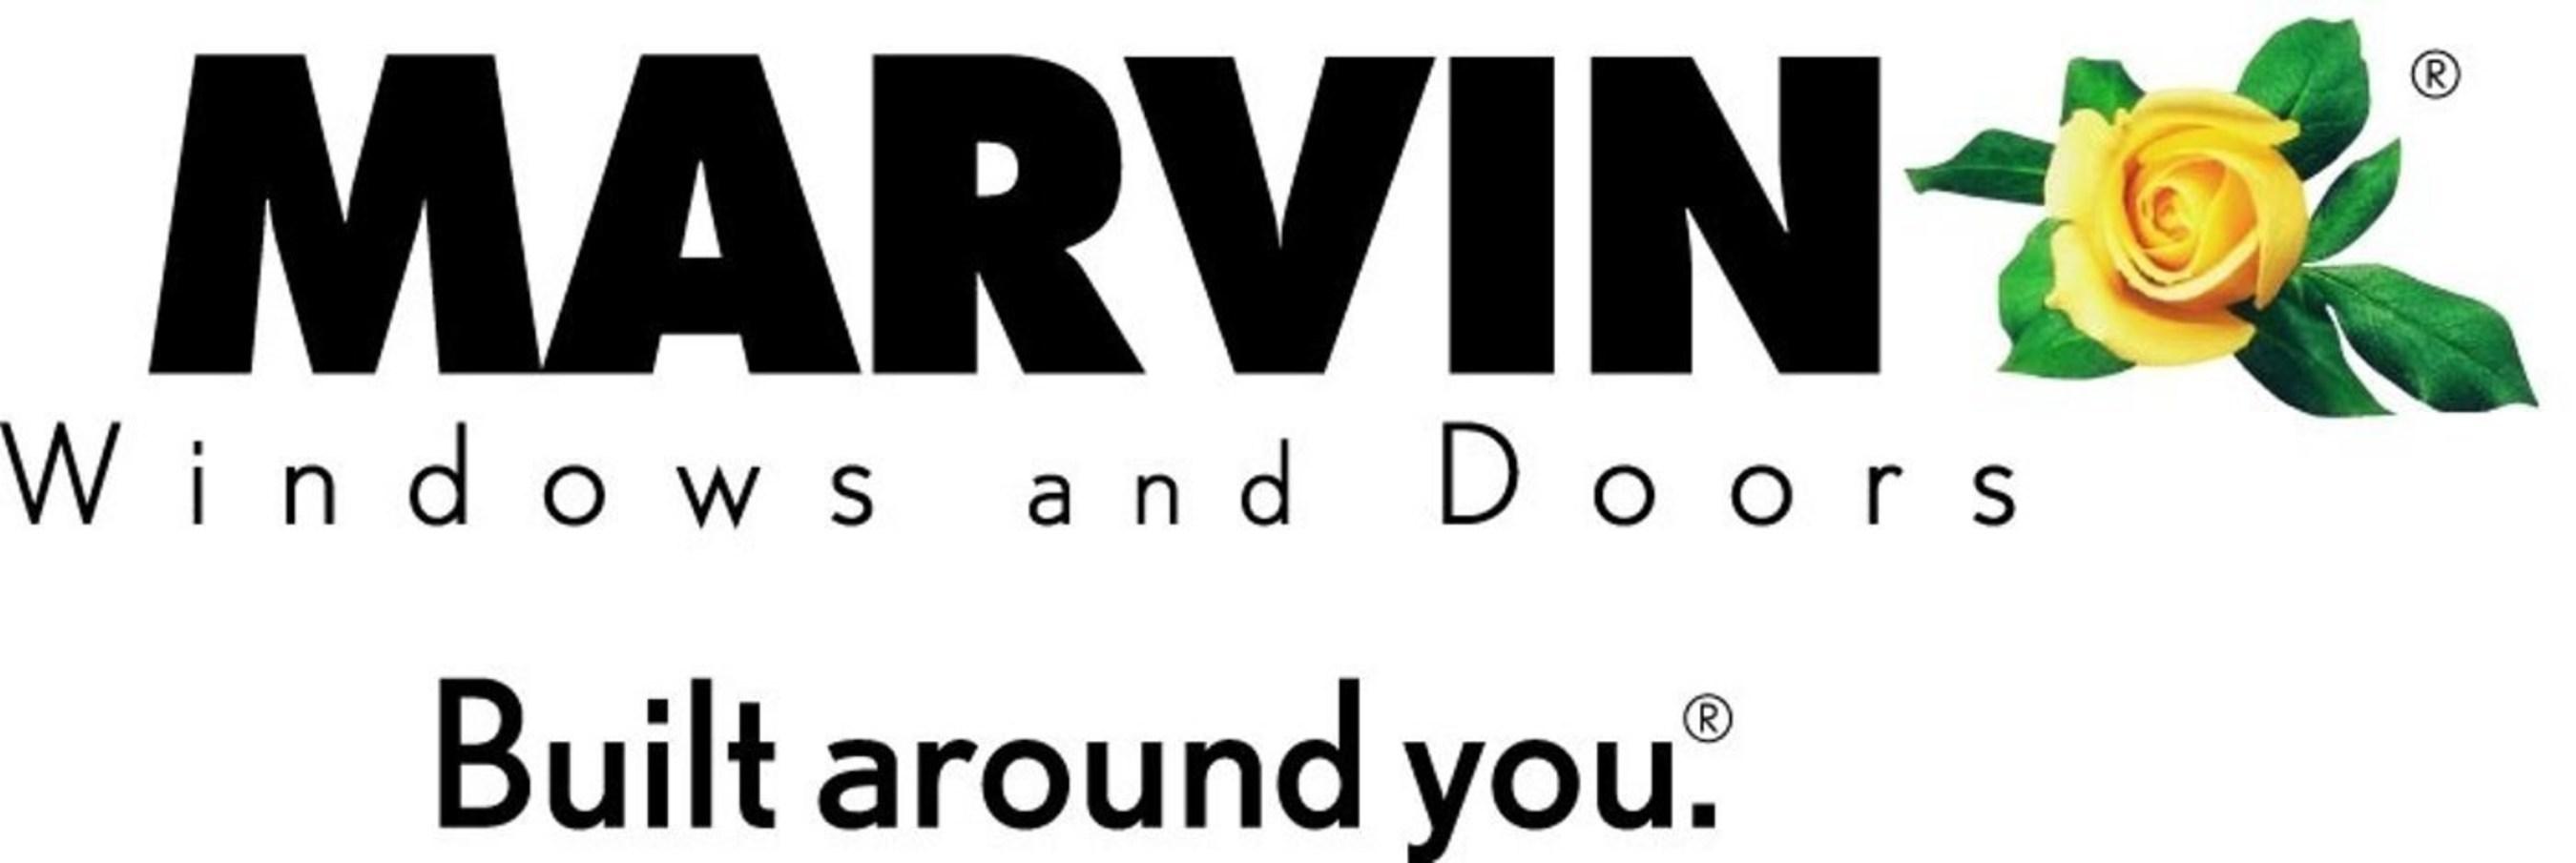 Marvin Windows and Doors Logo